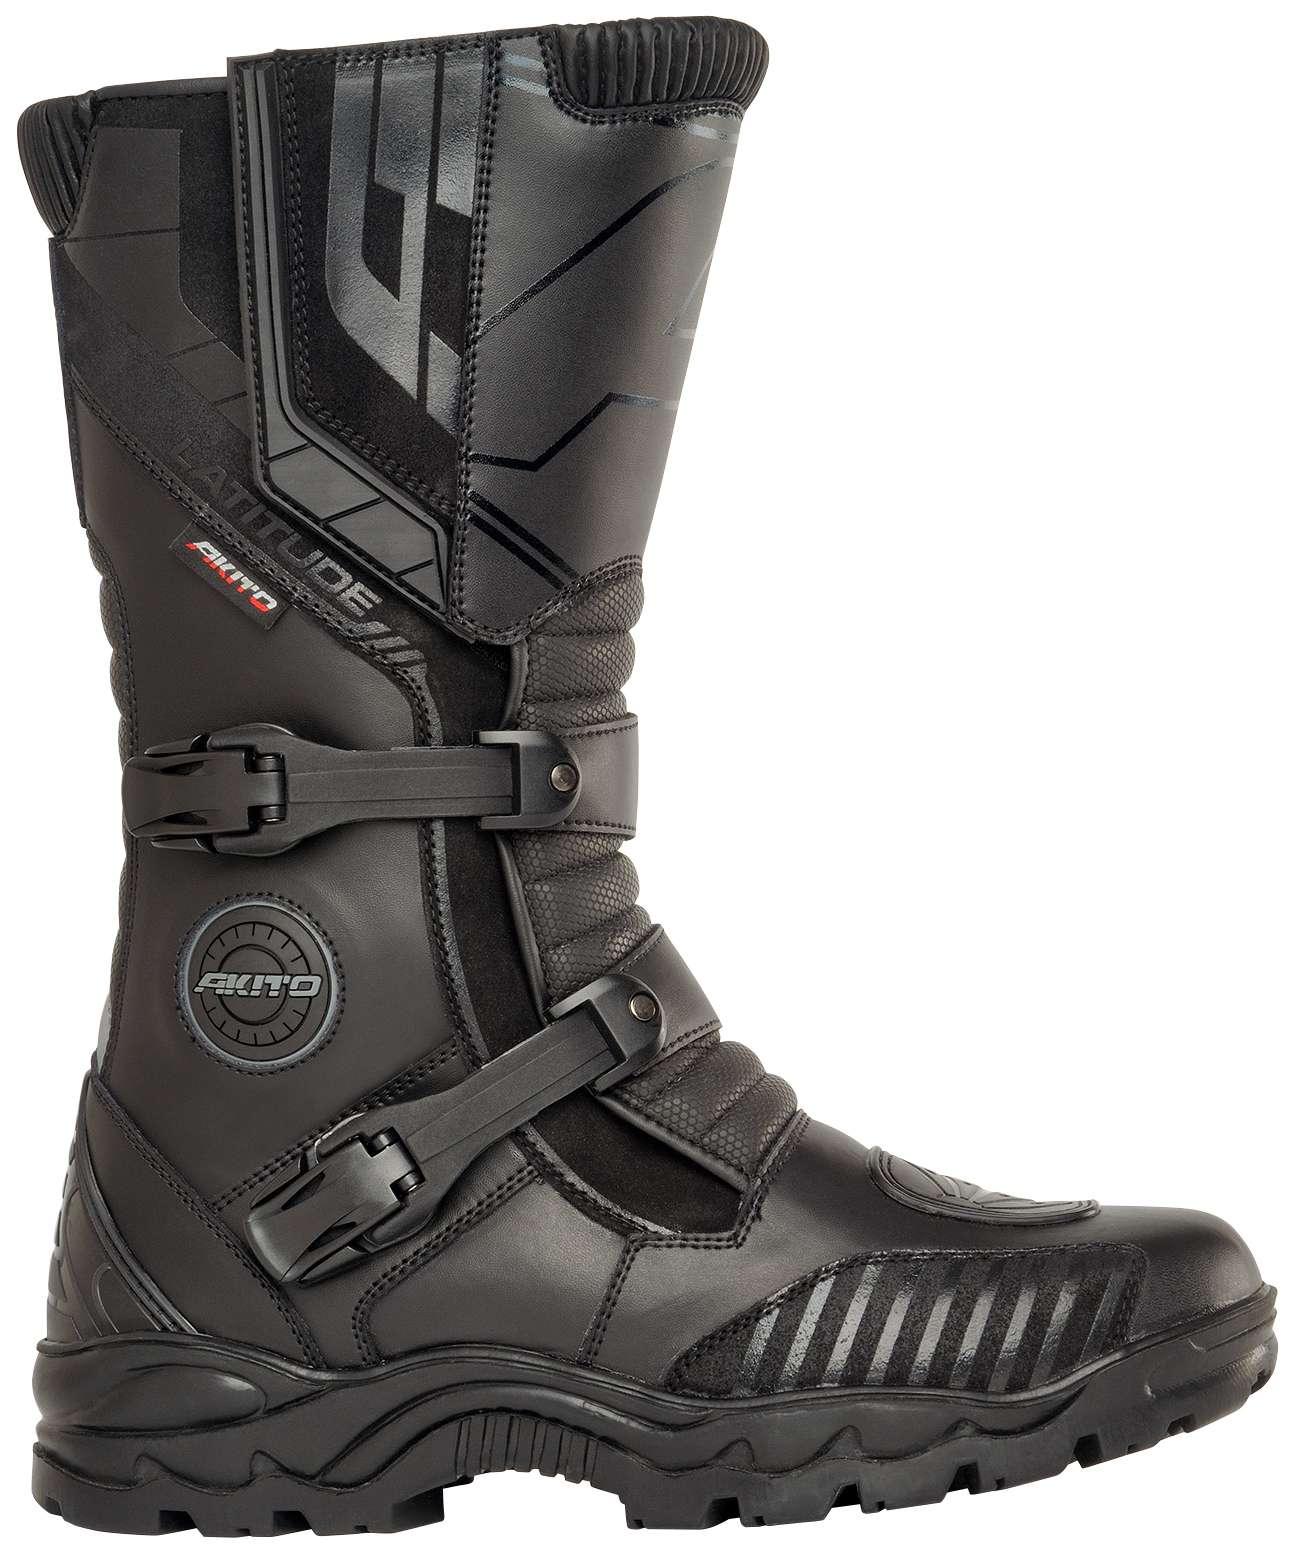 Black Akito Stealth Motorbike Motorcycle Touring Urban Boots